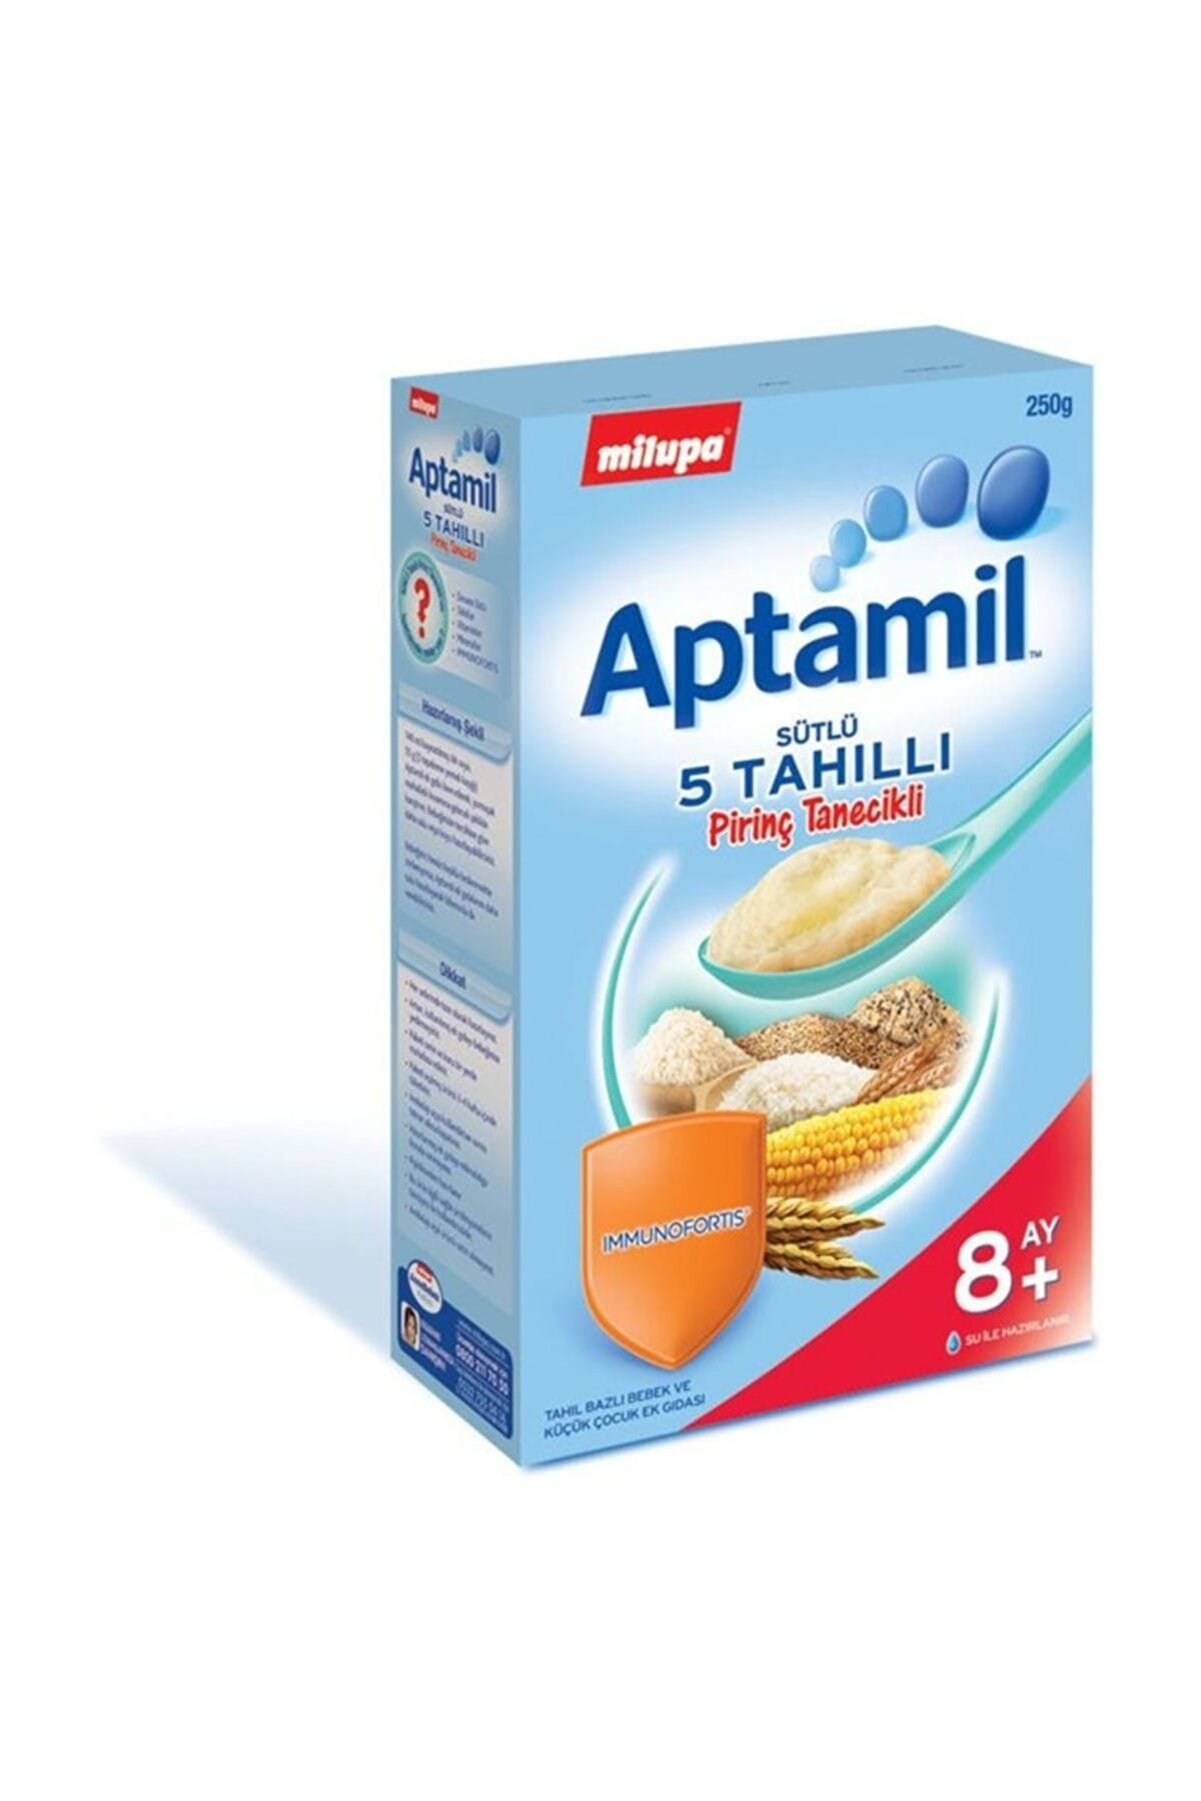 Aptamil Aptamil Sütlü 5 Tahıllı Pirinç Tanecikli +8 Ay 250 gr